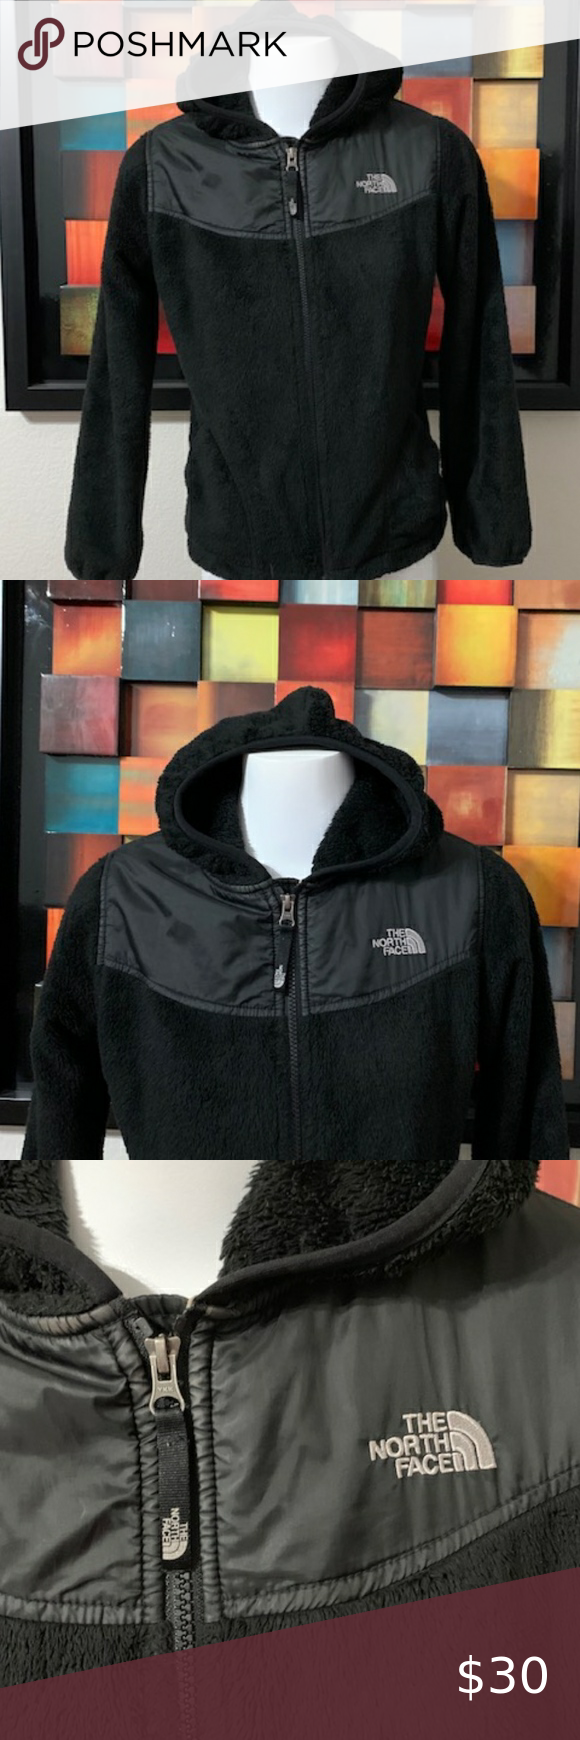 The North Face Black Fleece Jacket Size Large Black Fleece Jacket Black North Face Fleece Jacket [ 1740 x 580 Pixel ]